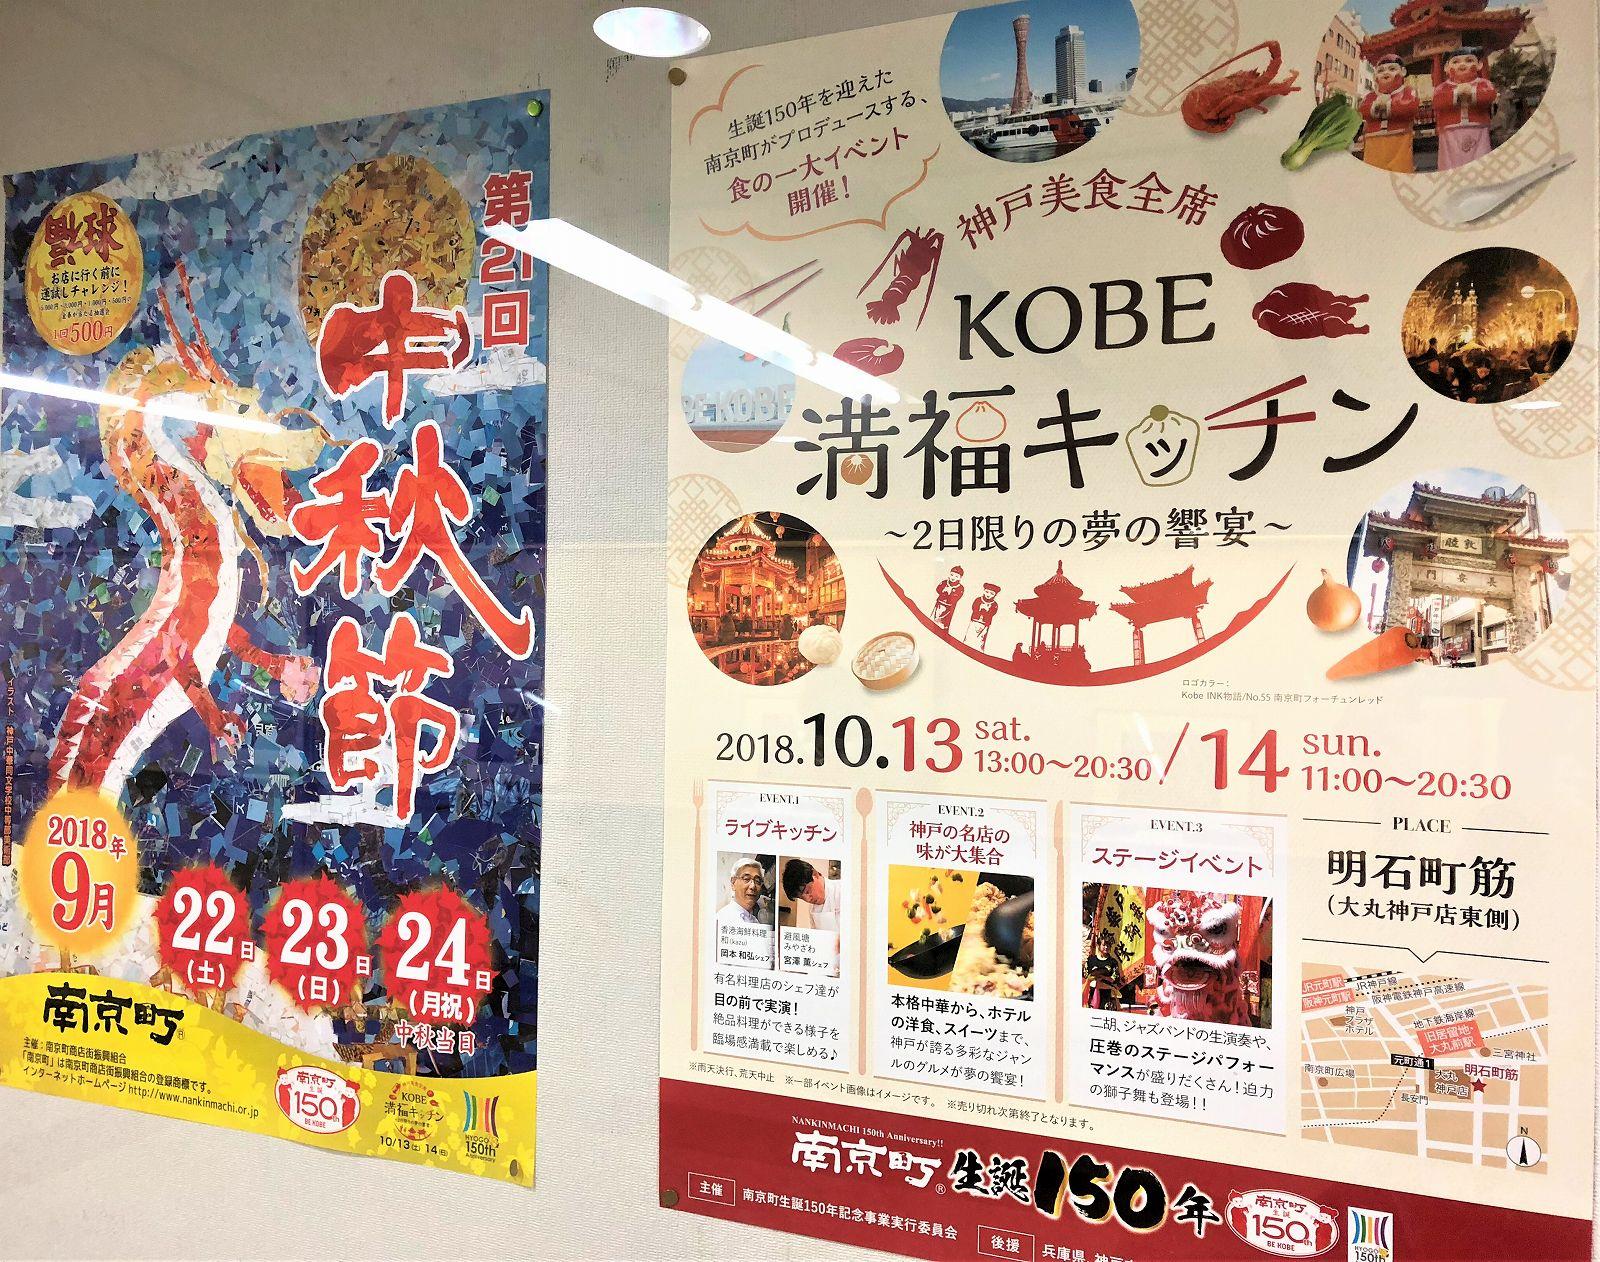 大丸神戸店東側・明石町筋で10月13日と14日に「神戸美食全席 KOBE満福キッチン」が開催されるよ! #KOBE満福キッチン #南京町生誕150年 #神戸観光